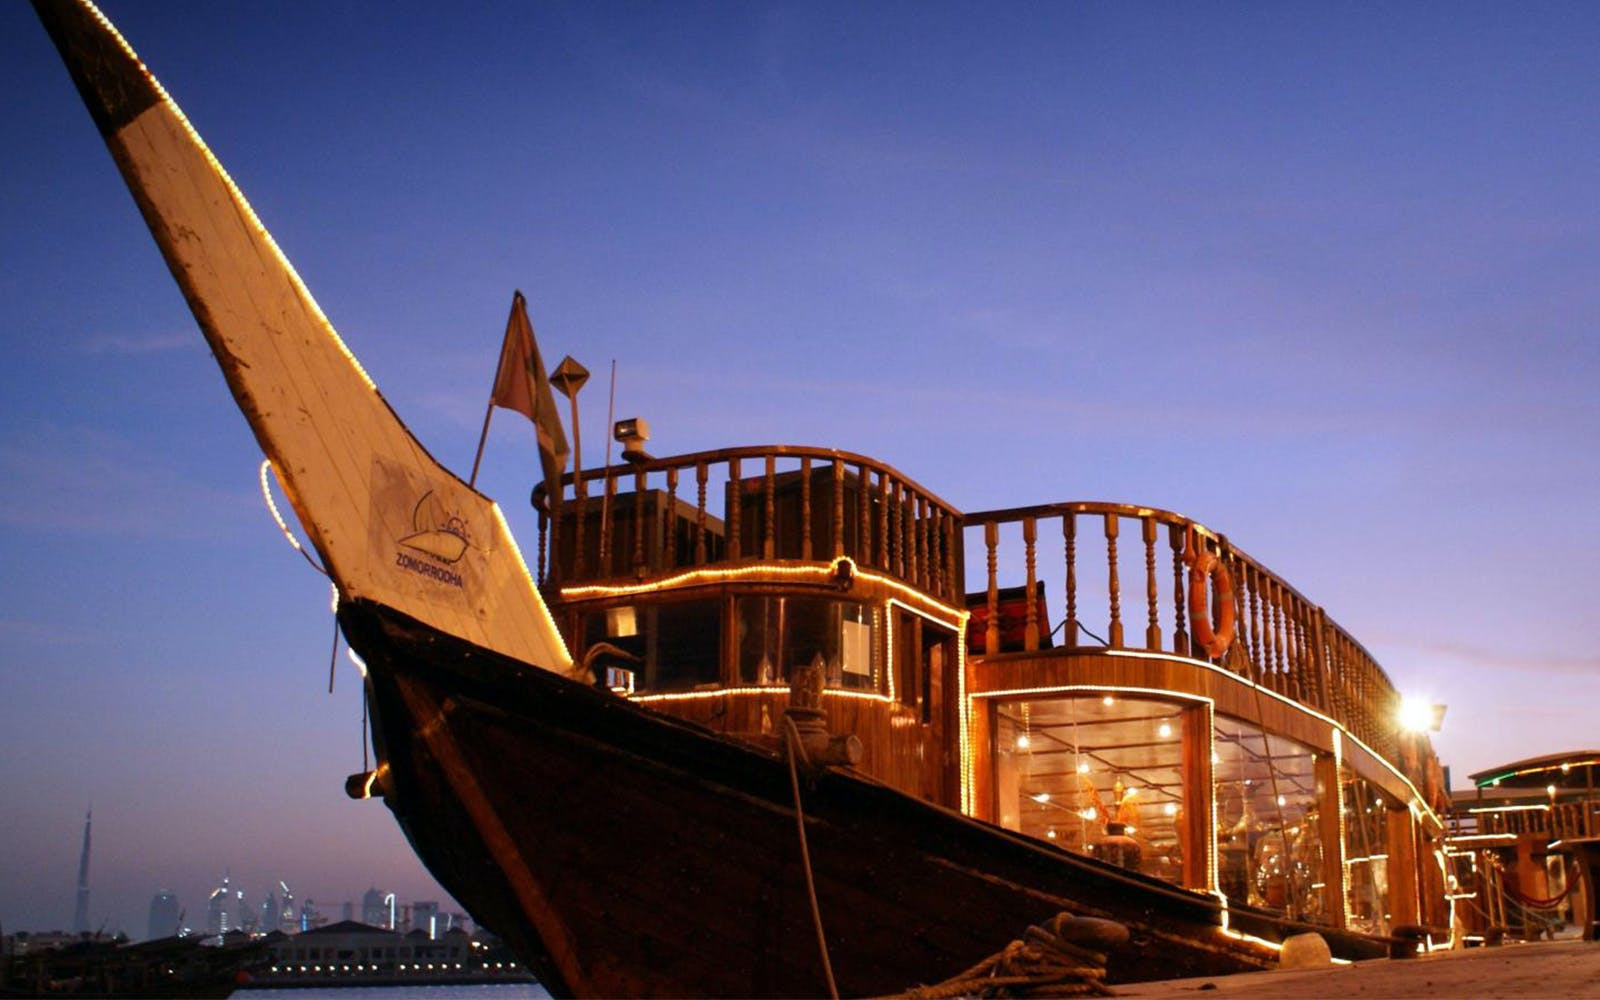 Best dhow cruise in Dubai - Dubai Creek